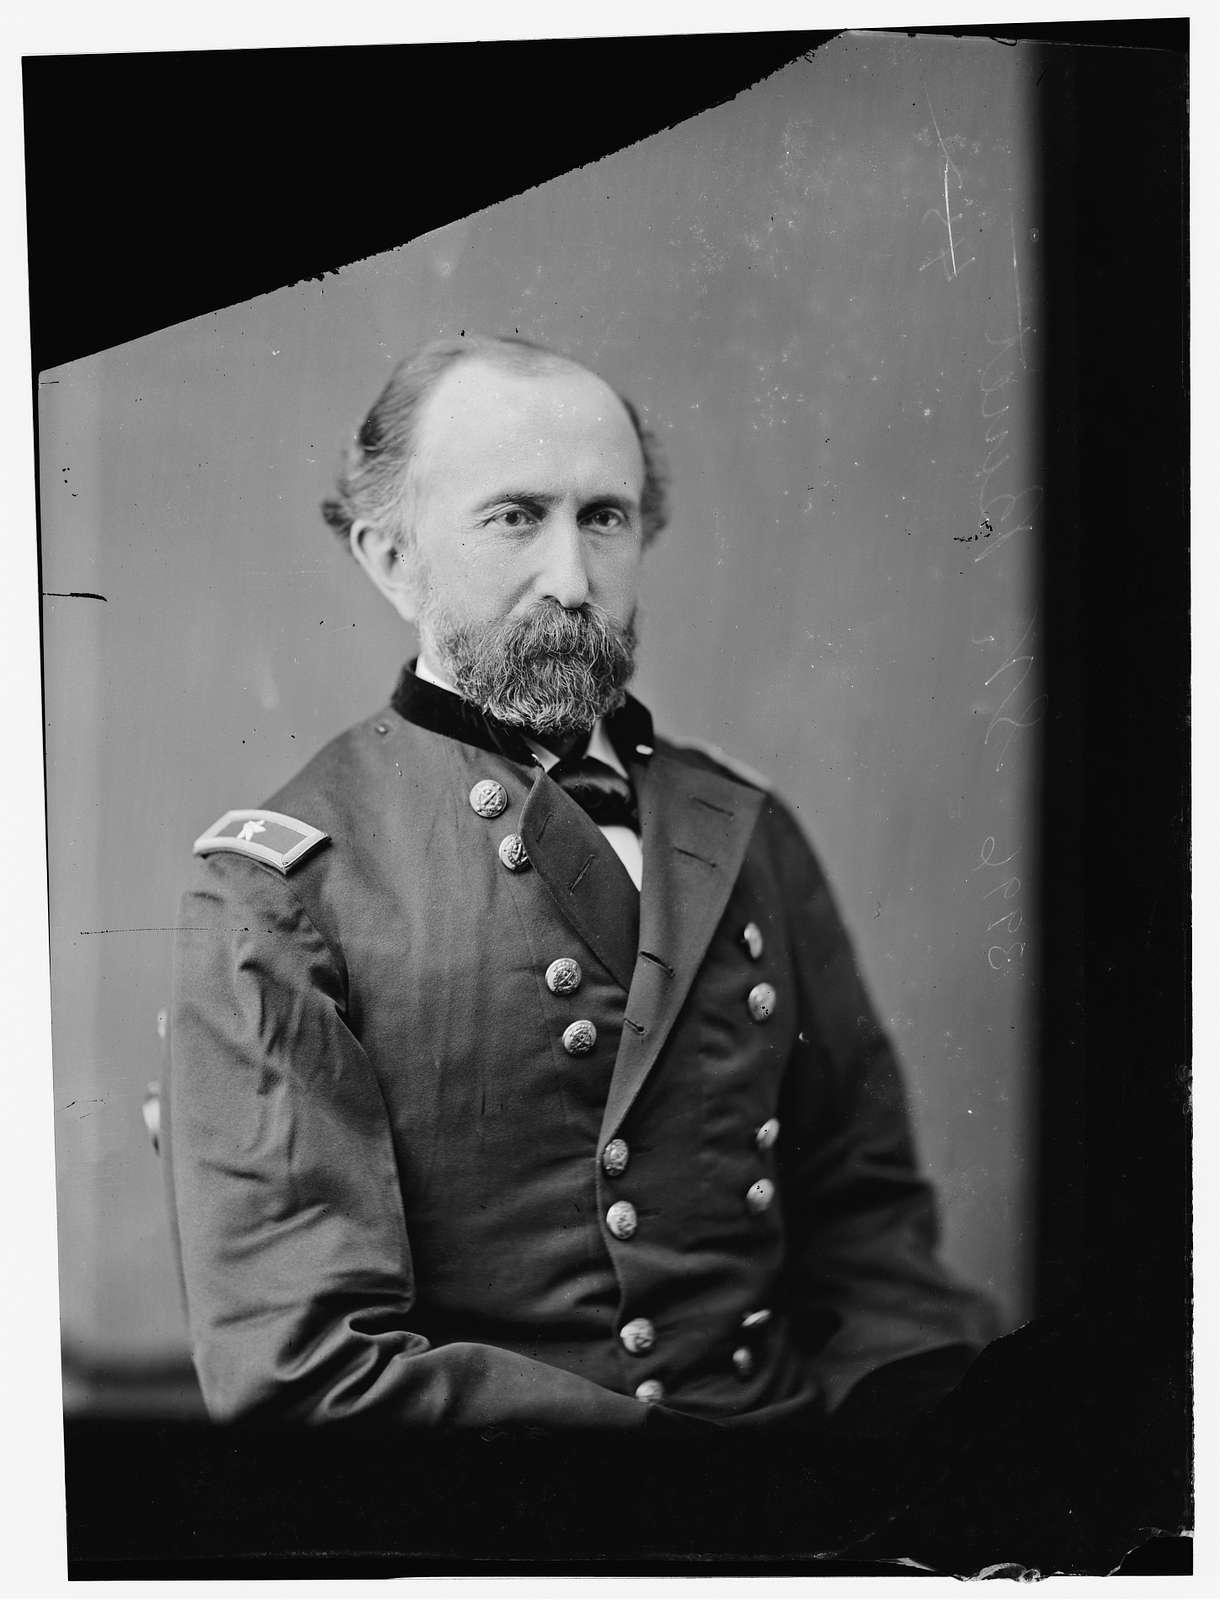 Benet, General S.V. U.S.A